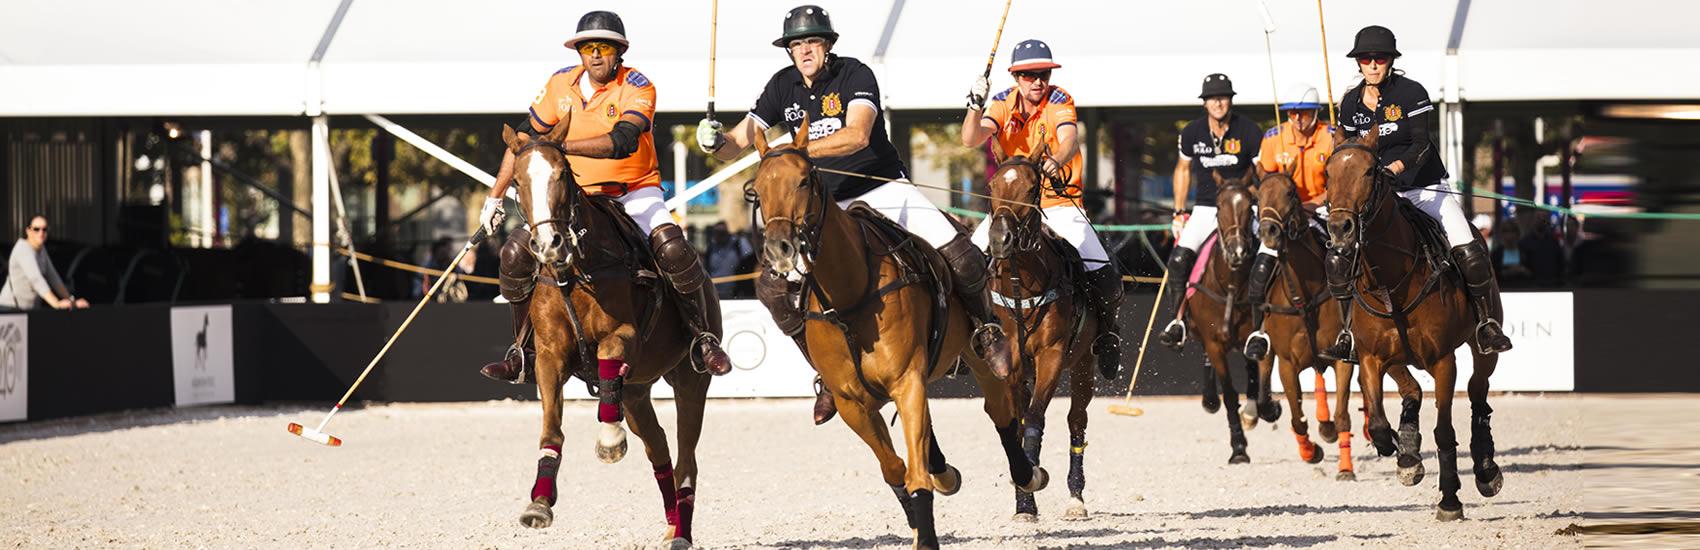 Team Holland Casino - Team ING - Nicole Versteeg - Philippe vd Kloot Meyburg - foto Lieuwe J. Zander